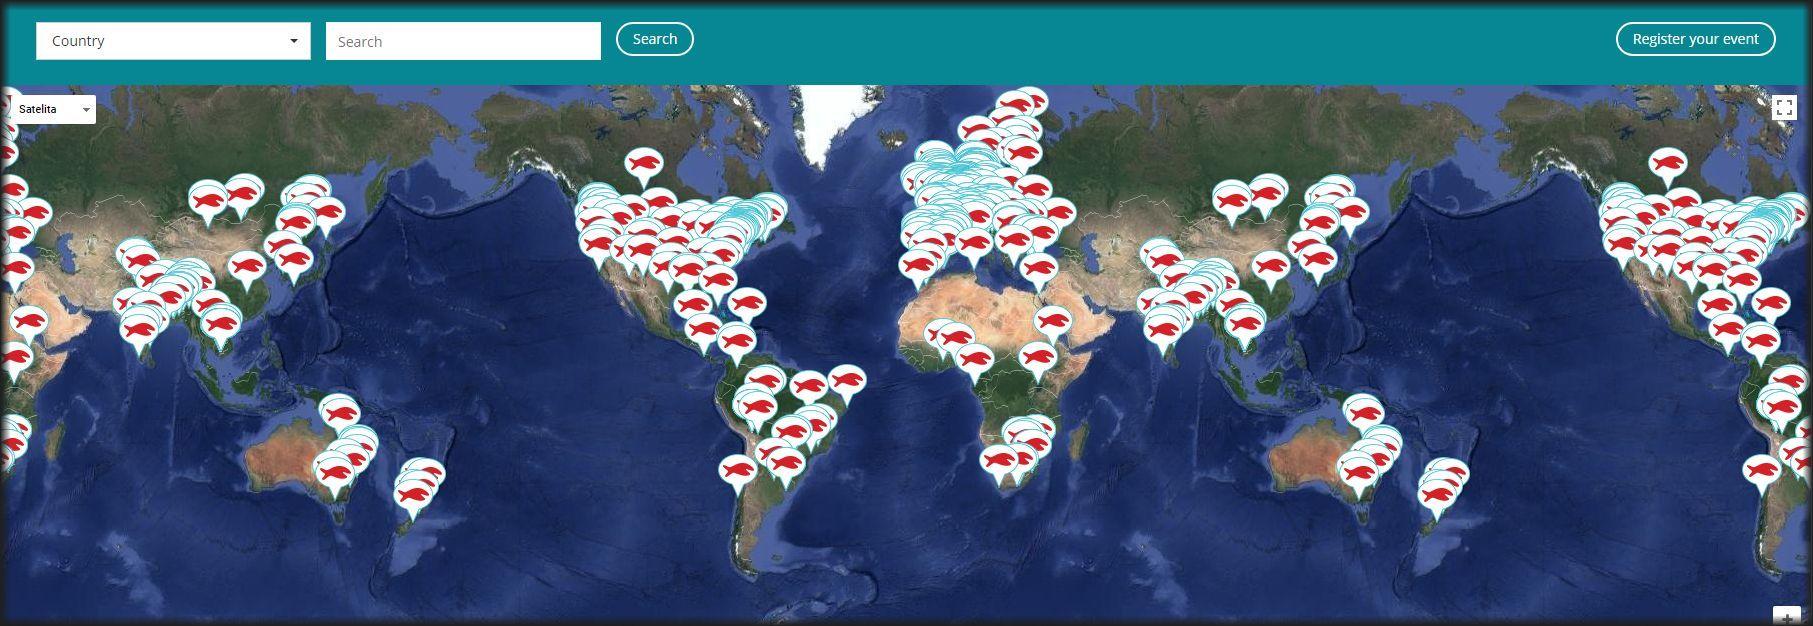 mapa_events_border